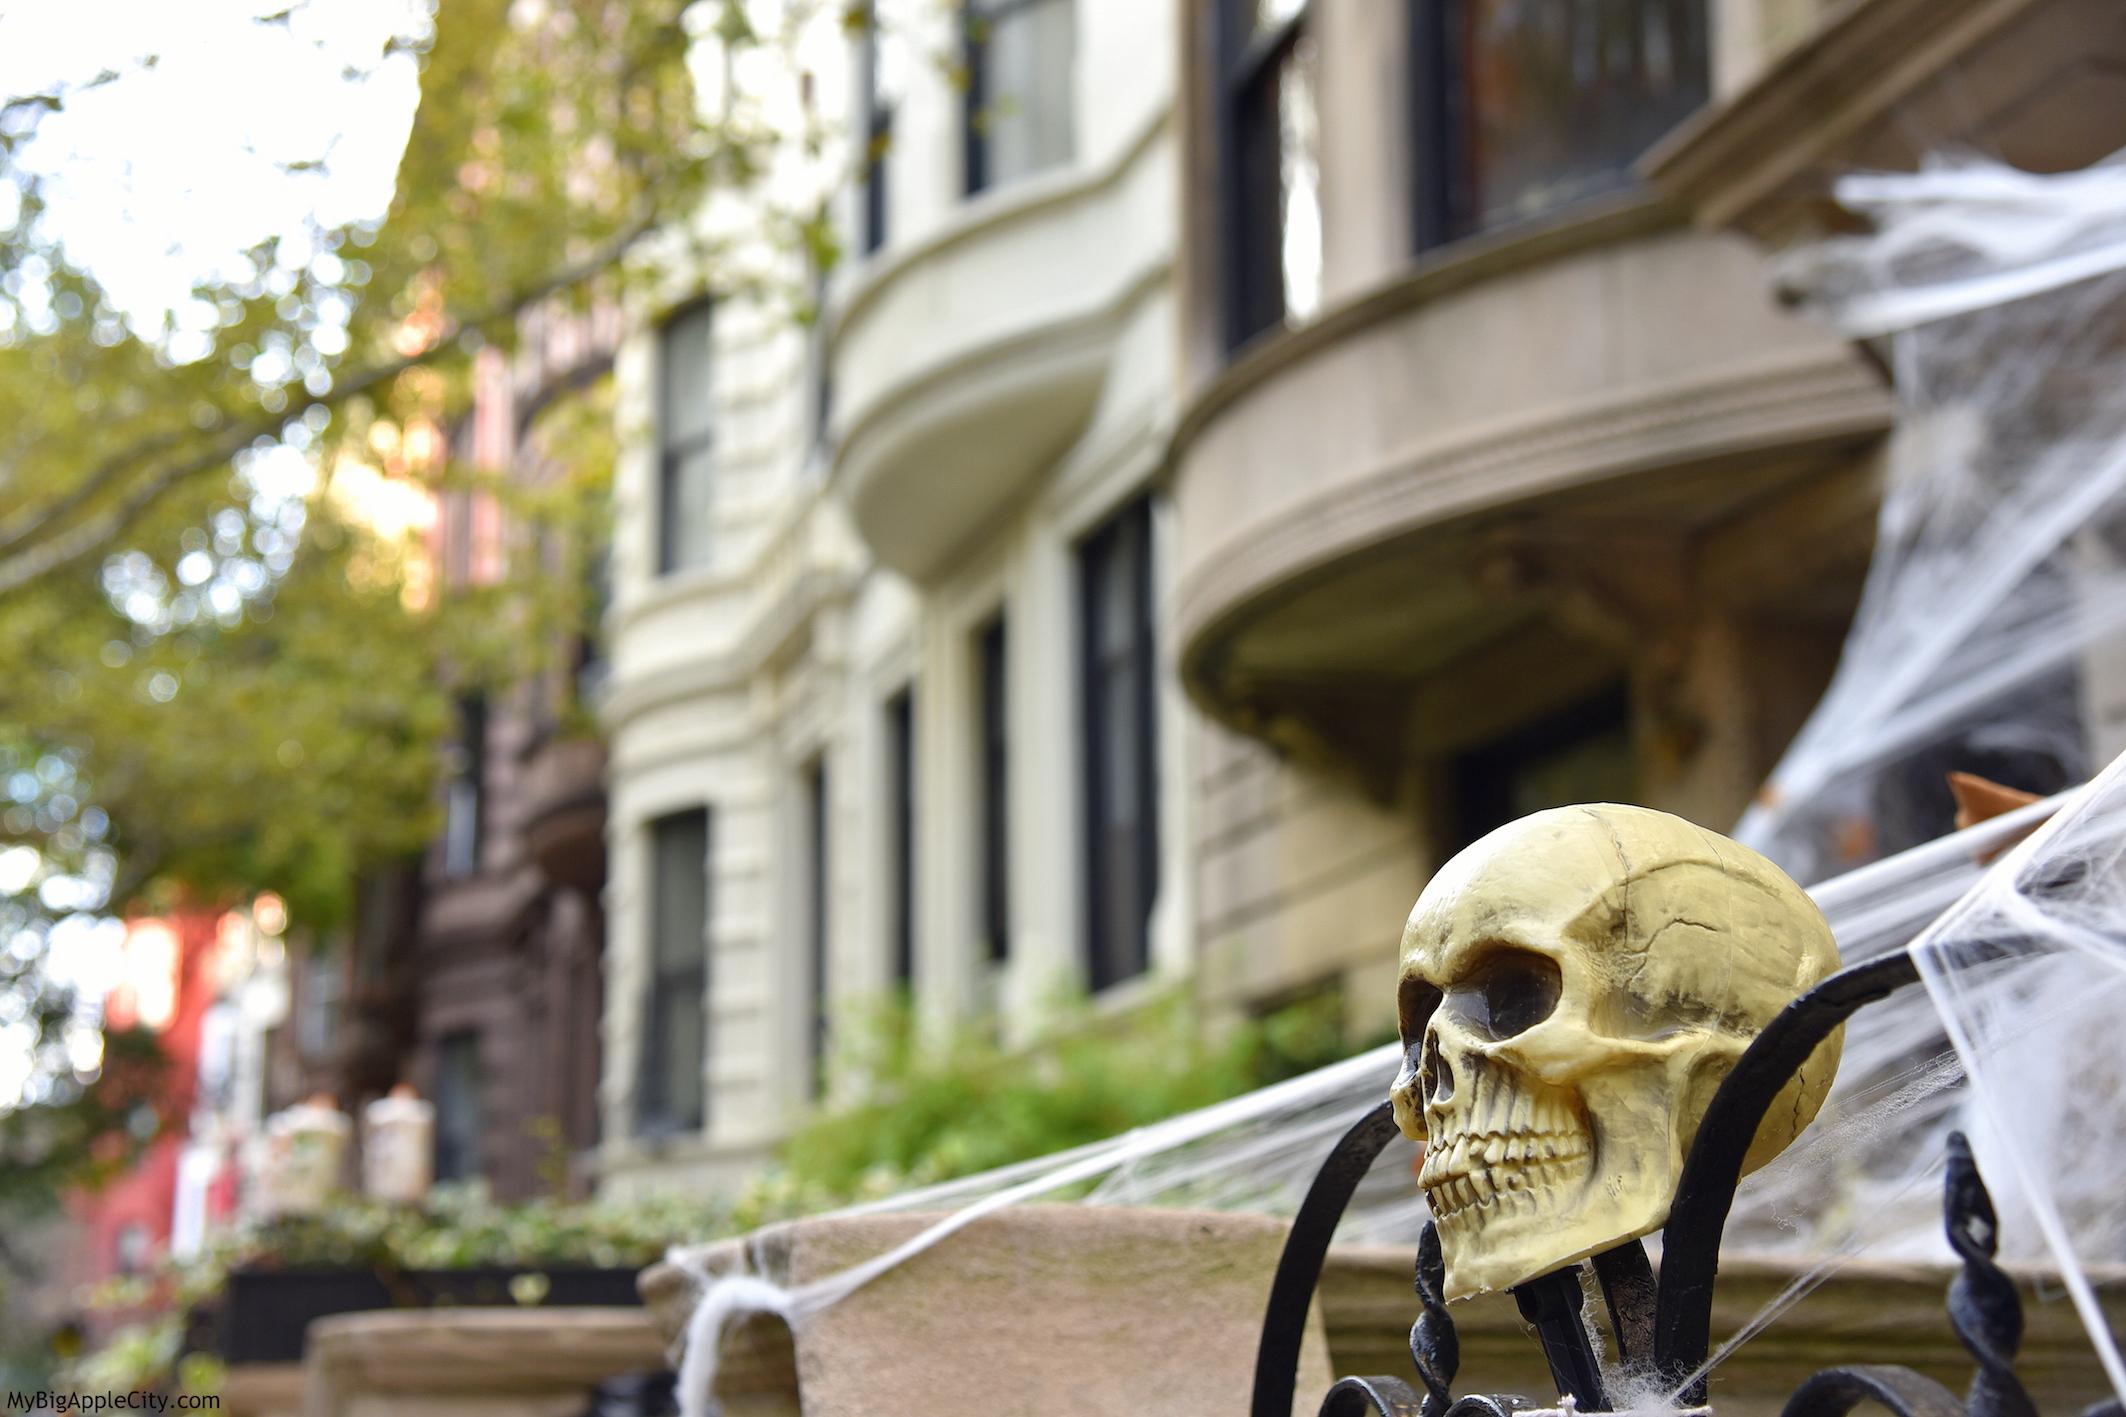 Halloween-new-york-manhattan-2015-blog-voyage-mybigapplecity